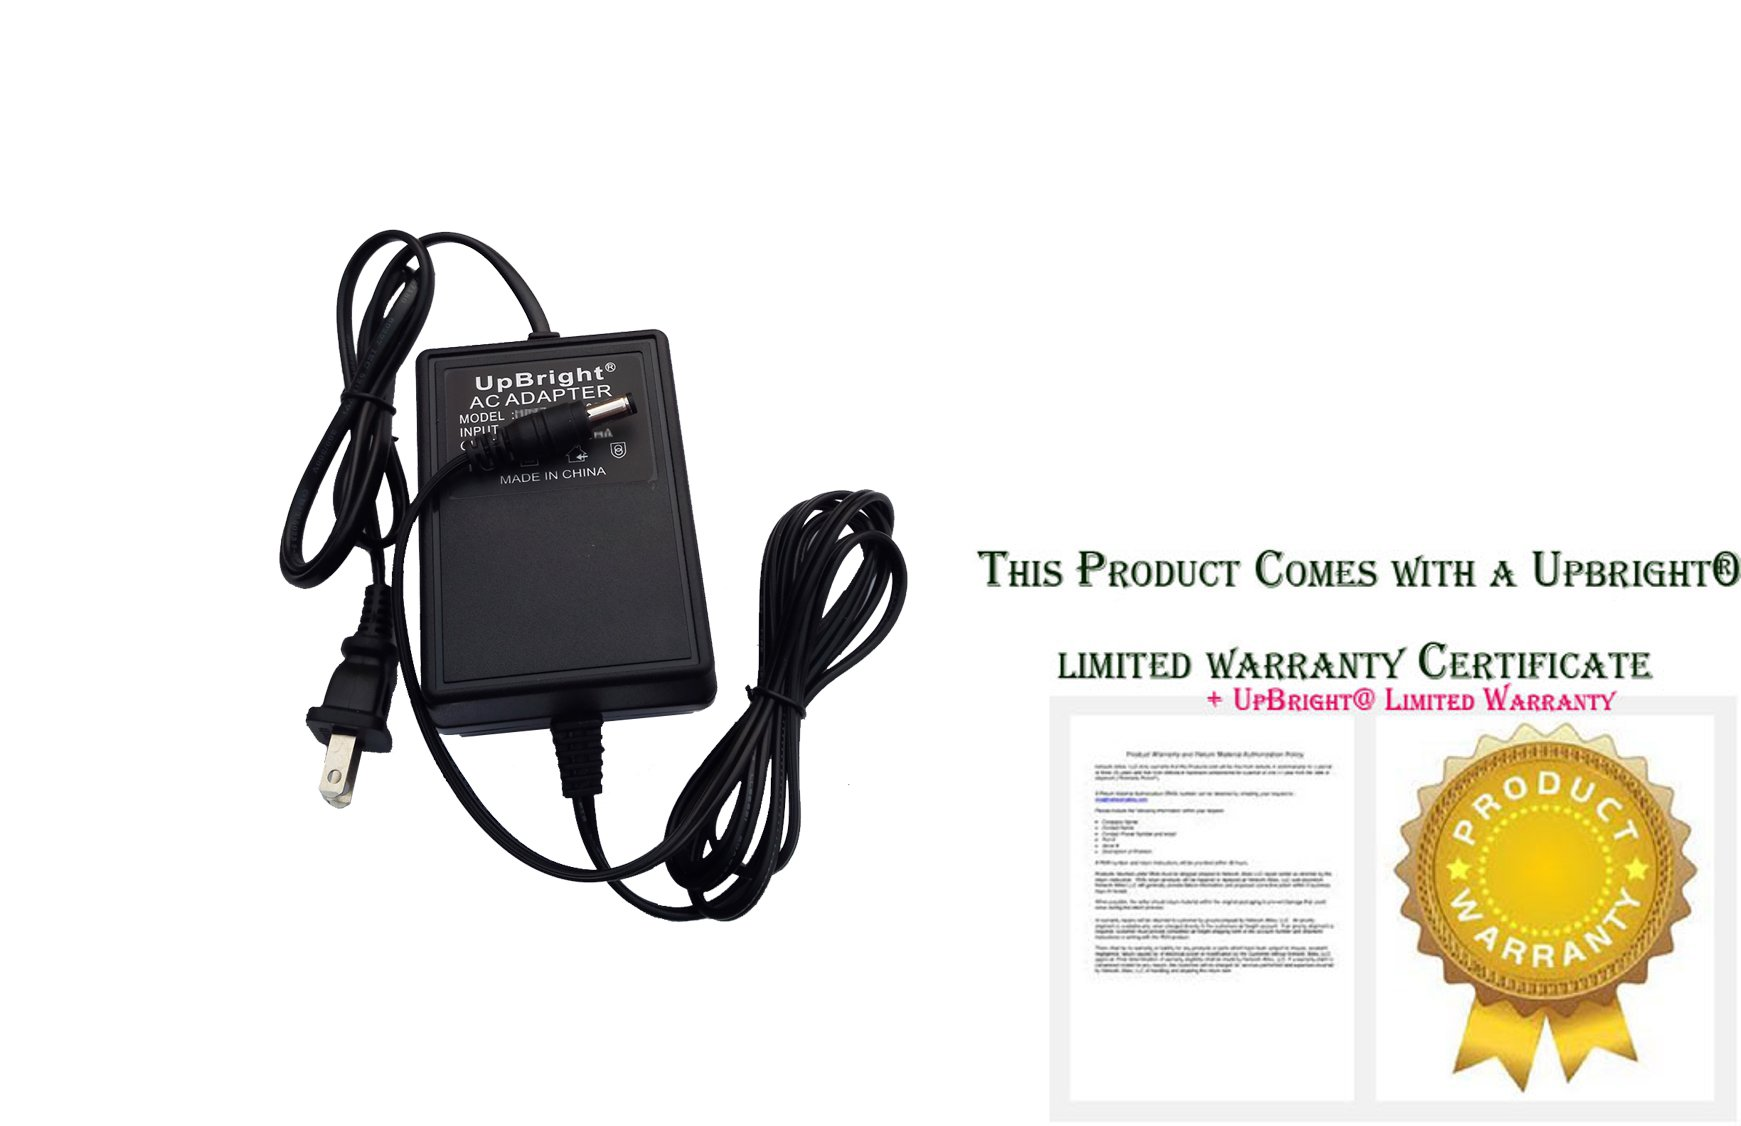 UpBright NEW AC Adapter For PreSonus TUBEPre Microphone Acousti-Q Studio Channel Tube Preamp 1st Version V1 Ver1 Pre Sonus TUBE Pre AcoustiQ CH Preamplifier Stereo Tube Preamp 16V - 18V Power Supply